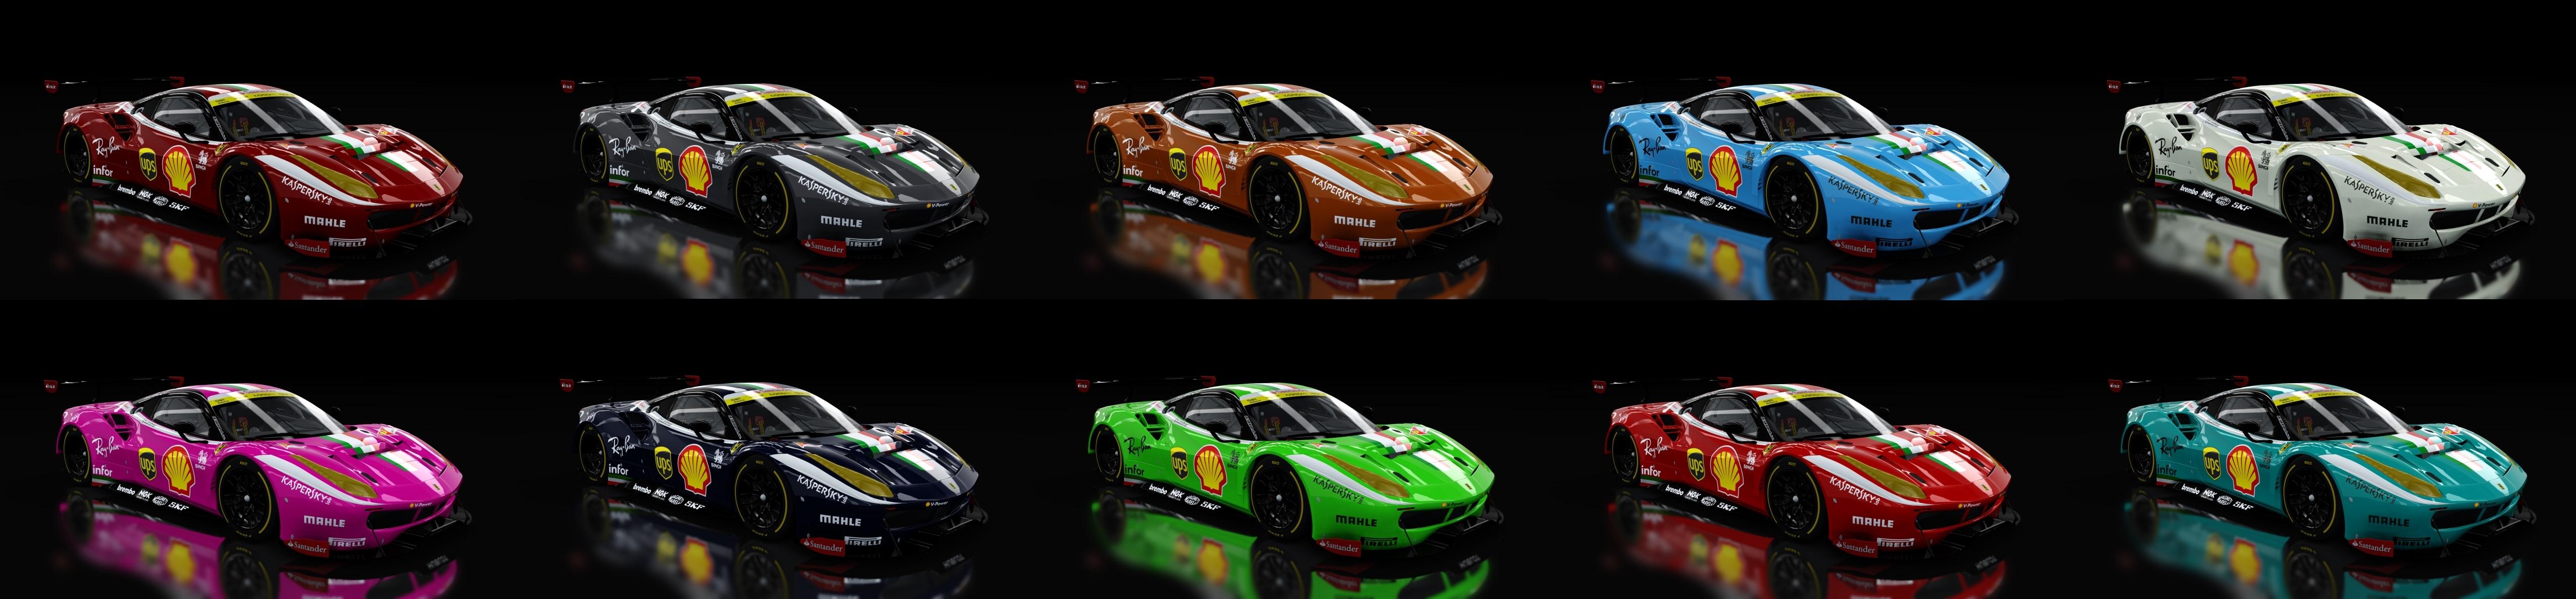 Scuderia_Ferrari_8.jpg